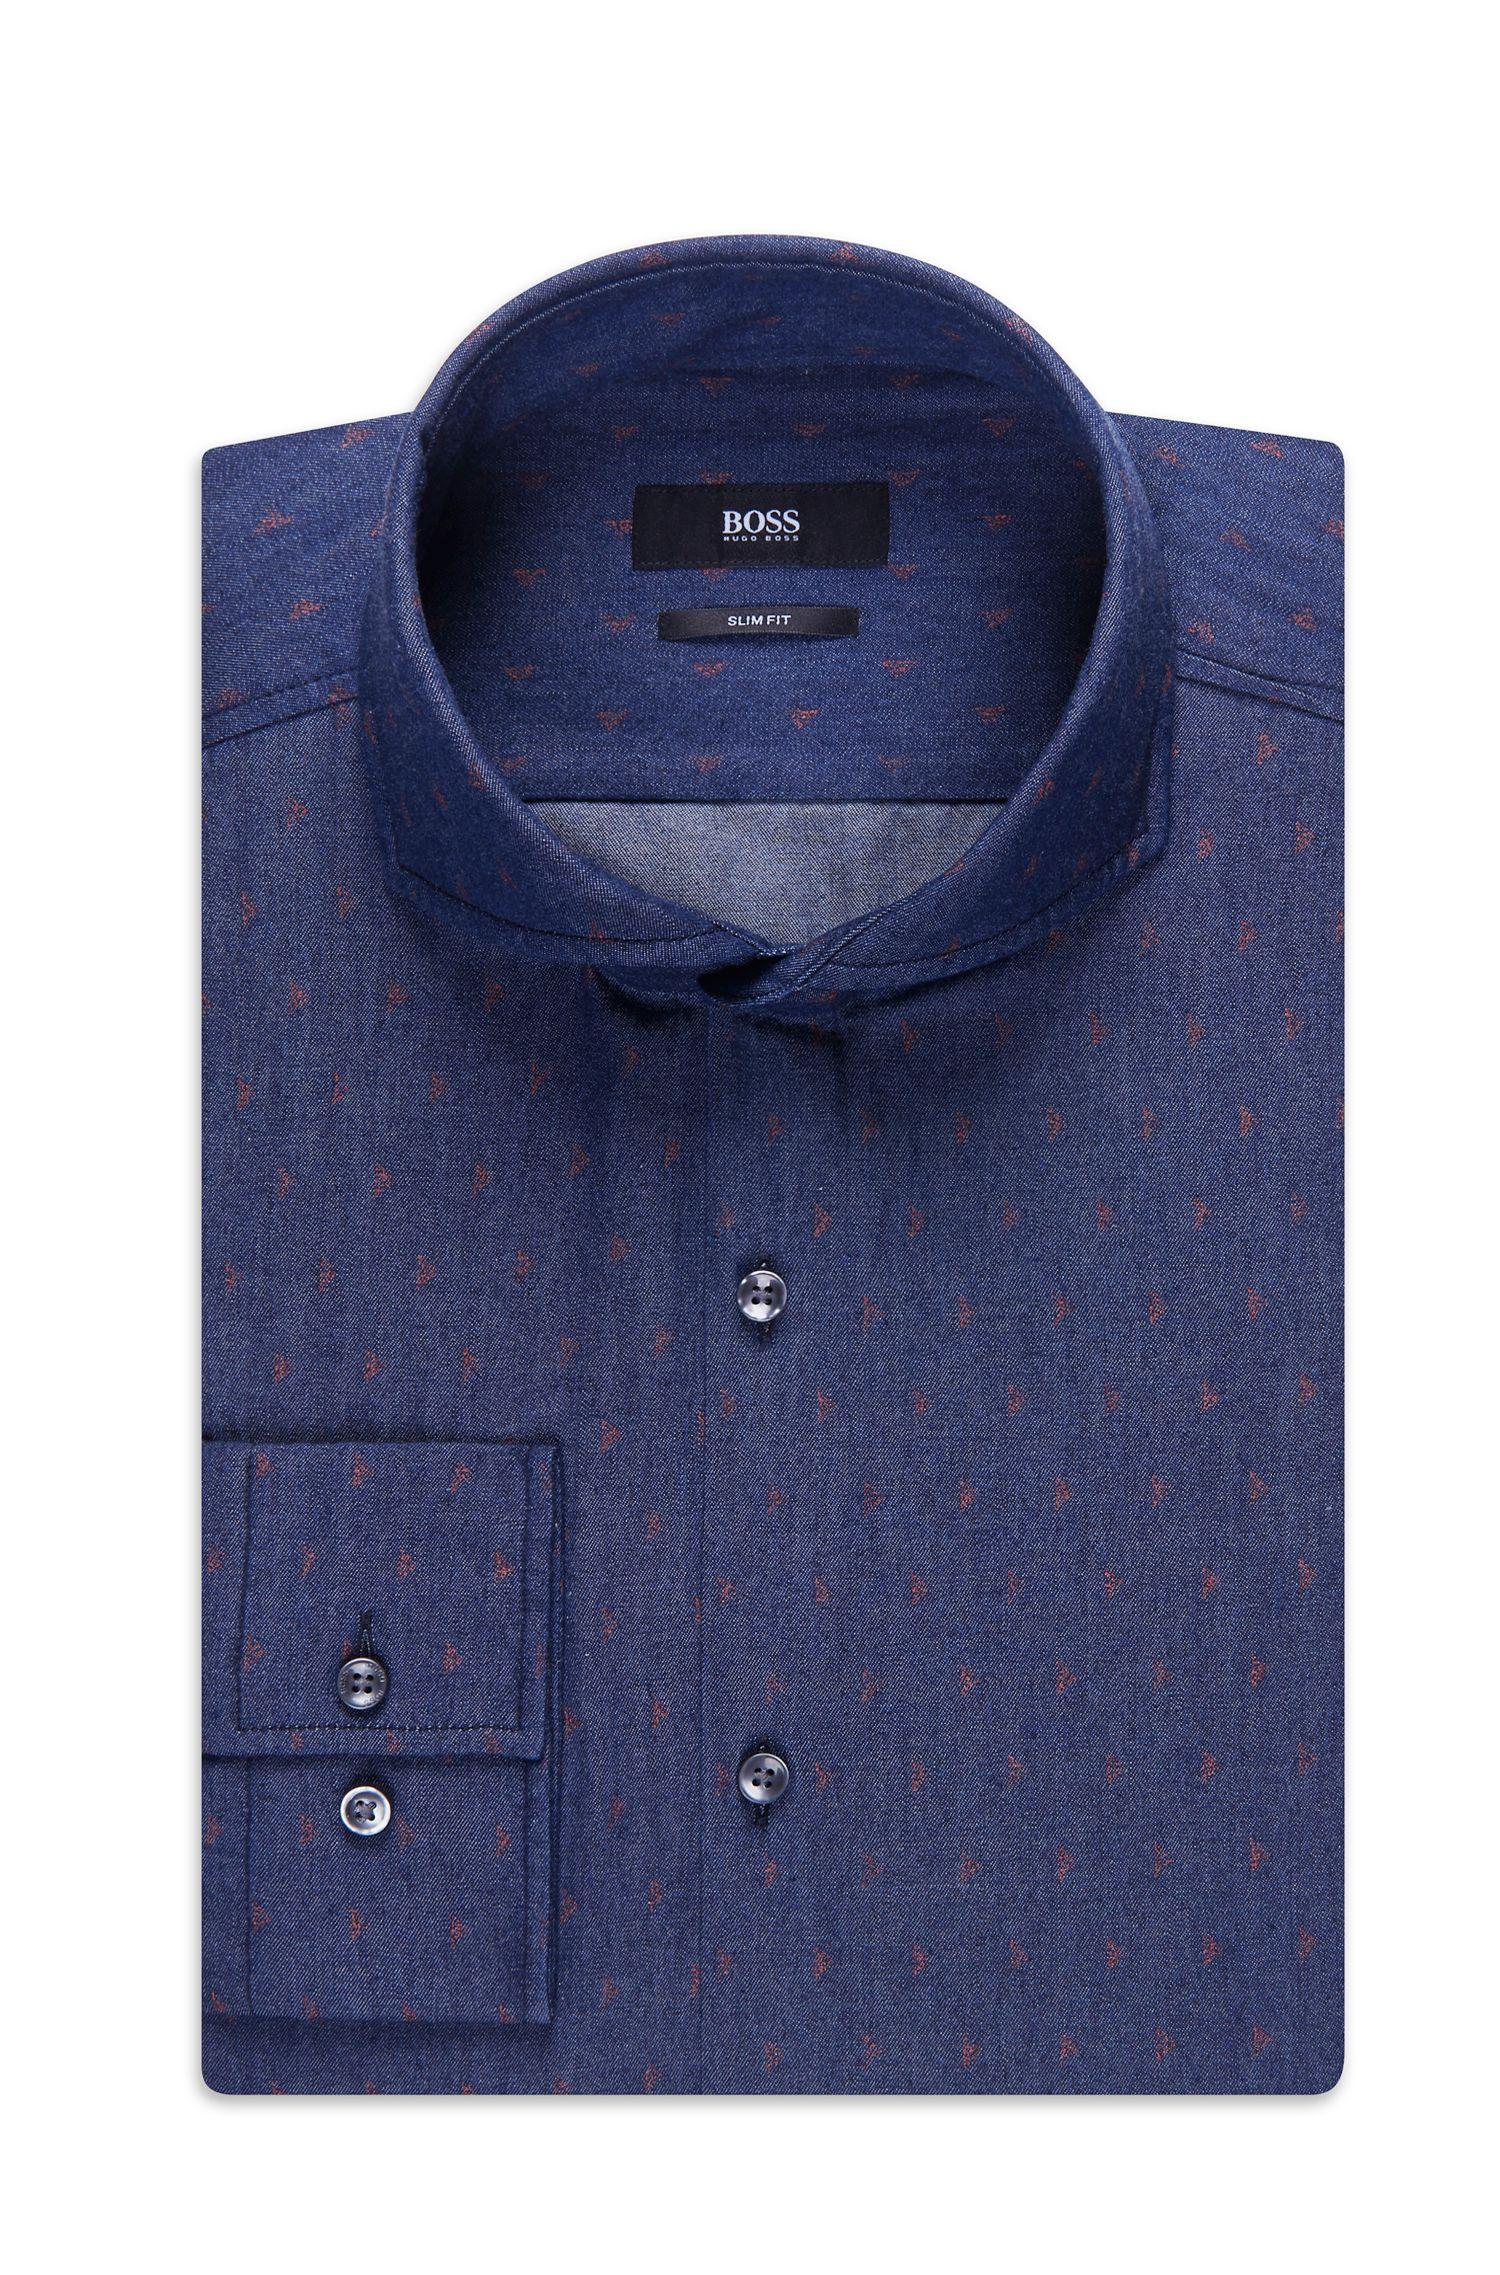 'Dwayne' | Slim Fit, Cotton Denim Dress Shirt